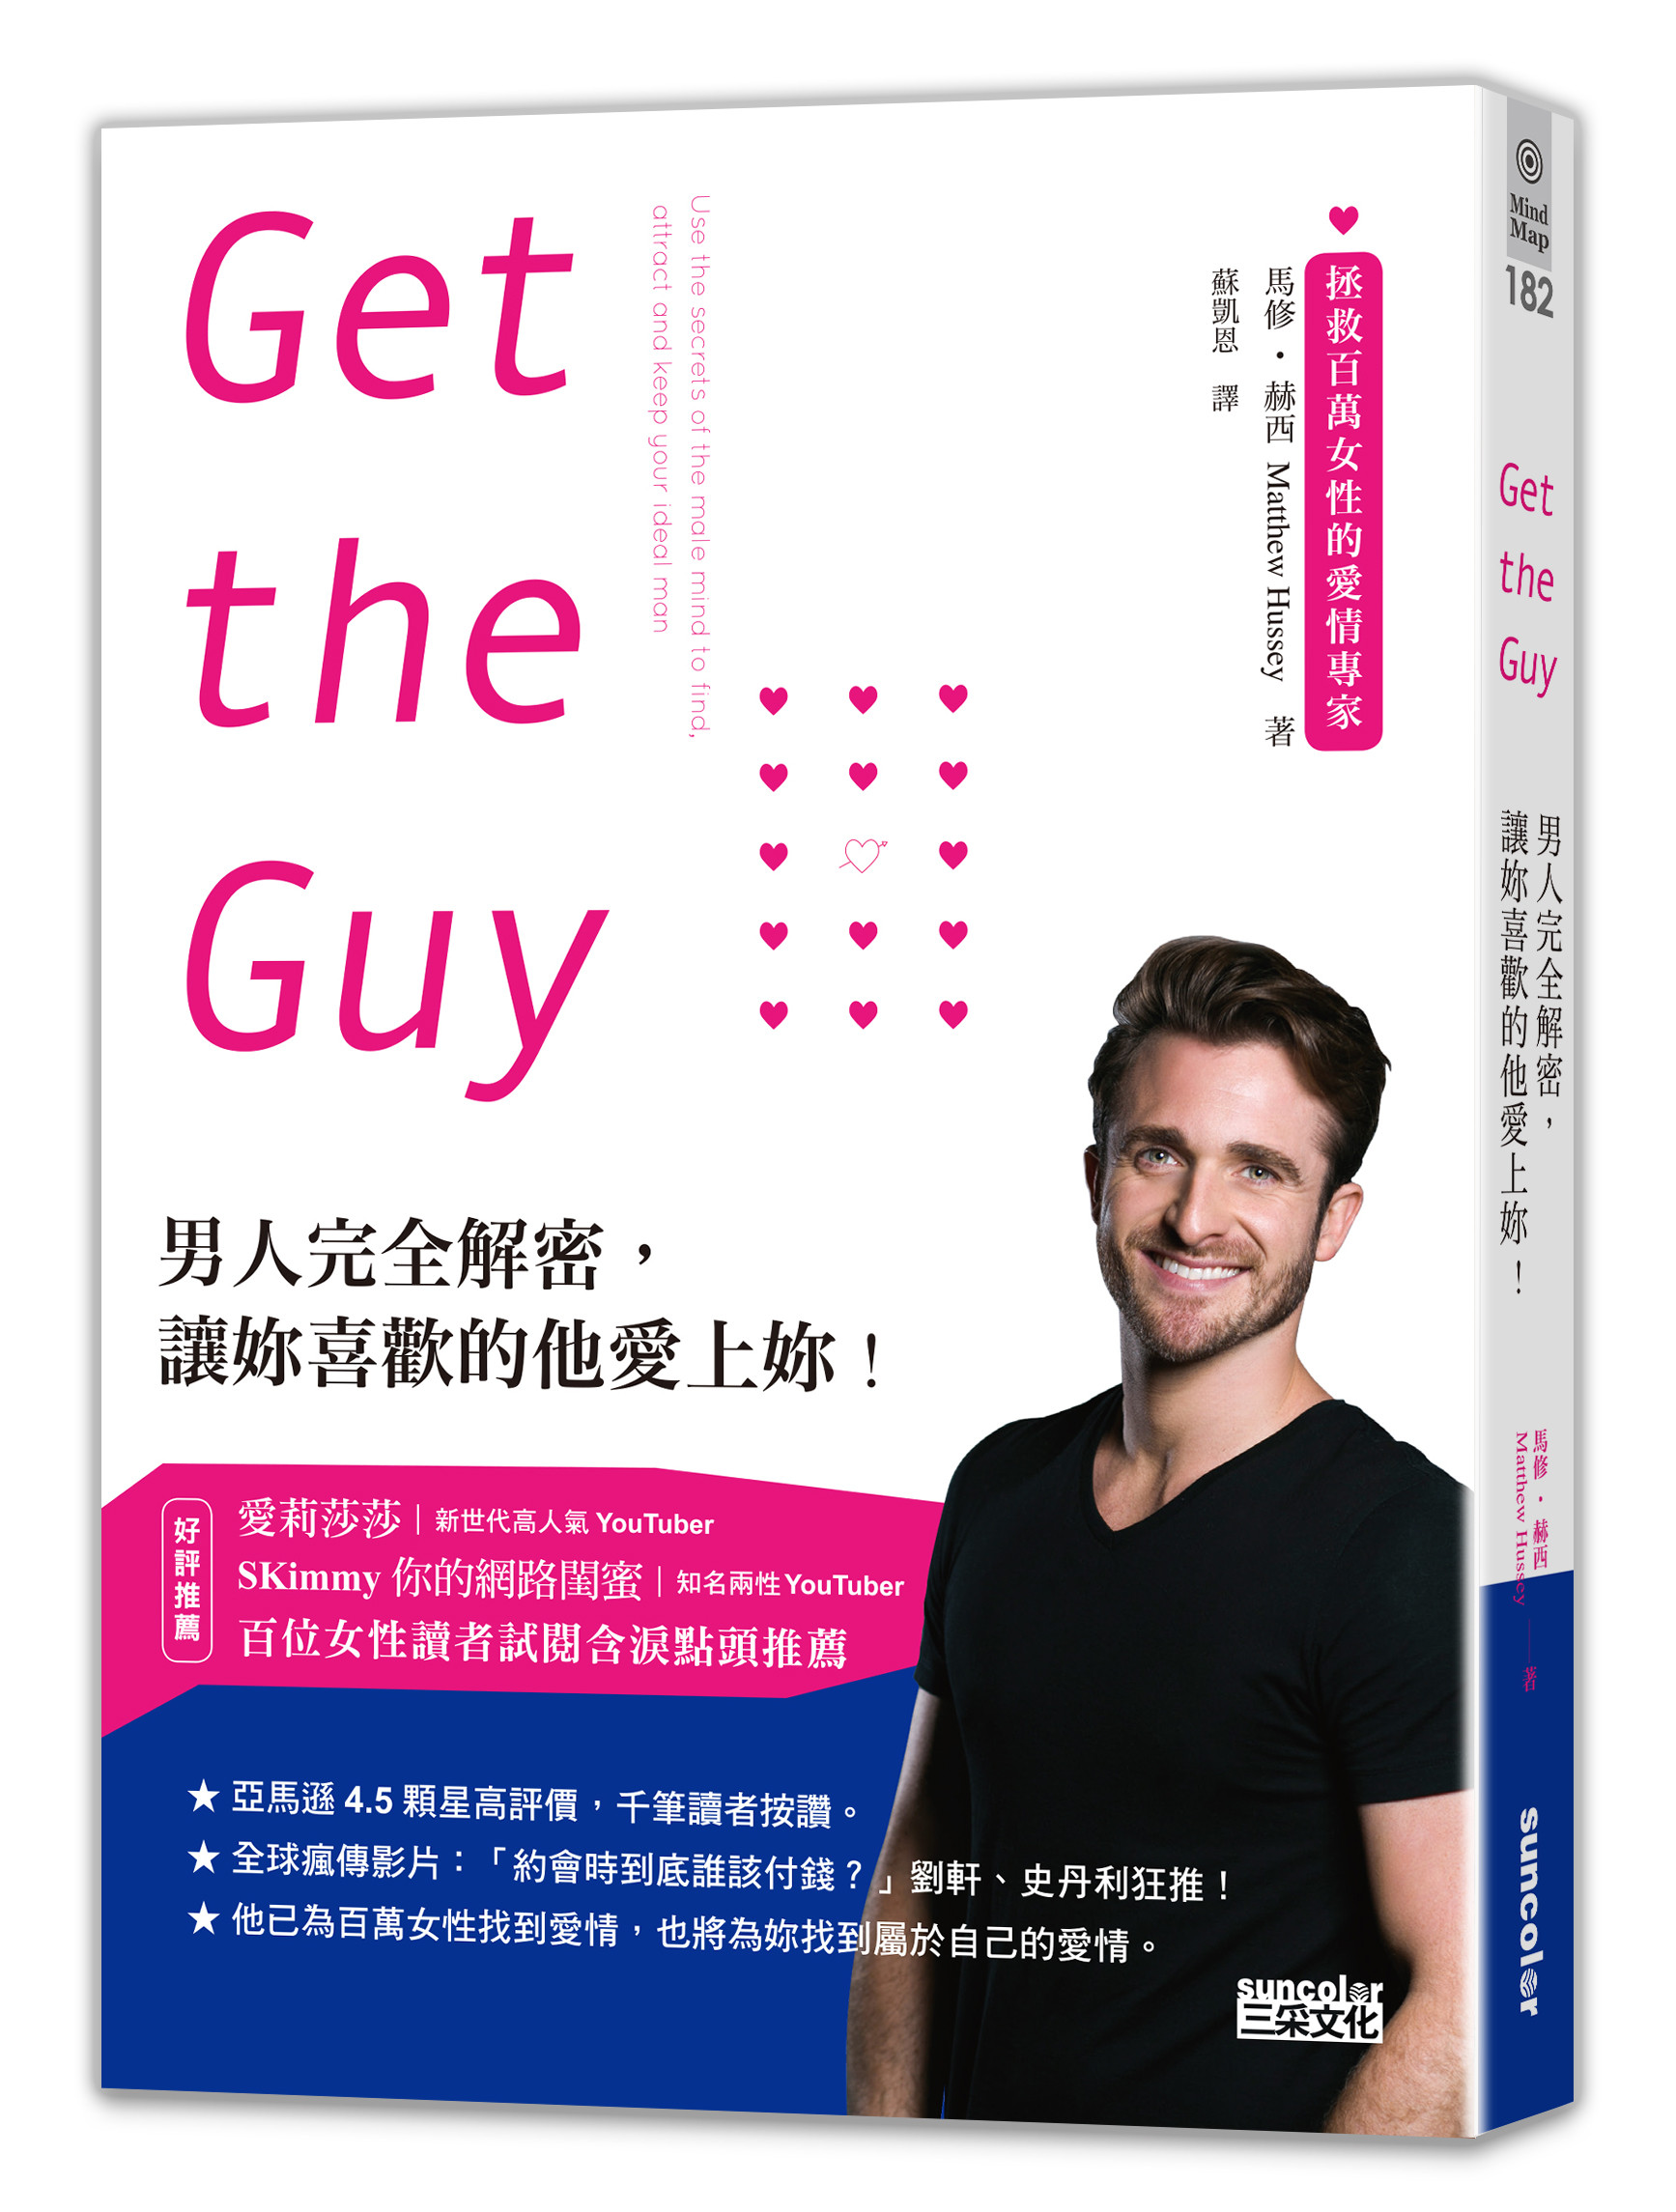 《Get the Guy:男人完全解密,讓妳喜歡的他愛上妳!》書封(圖/業者三采出版提供)